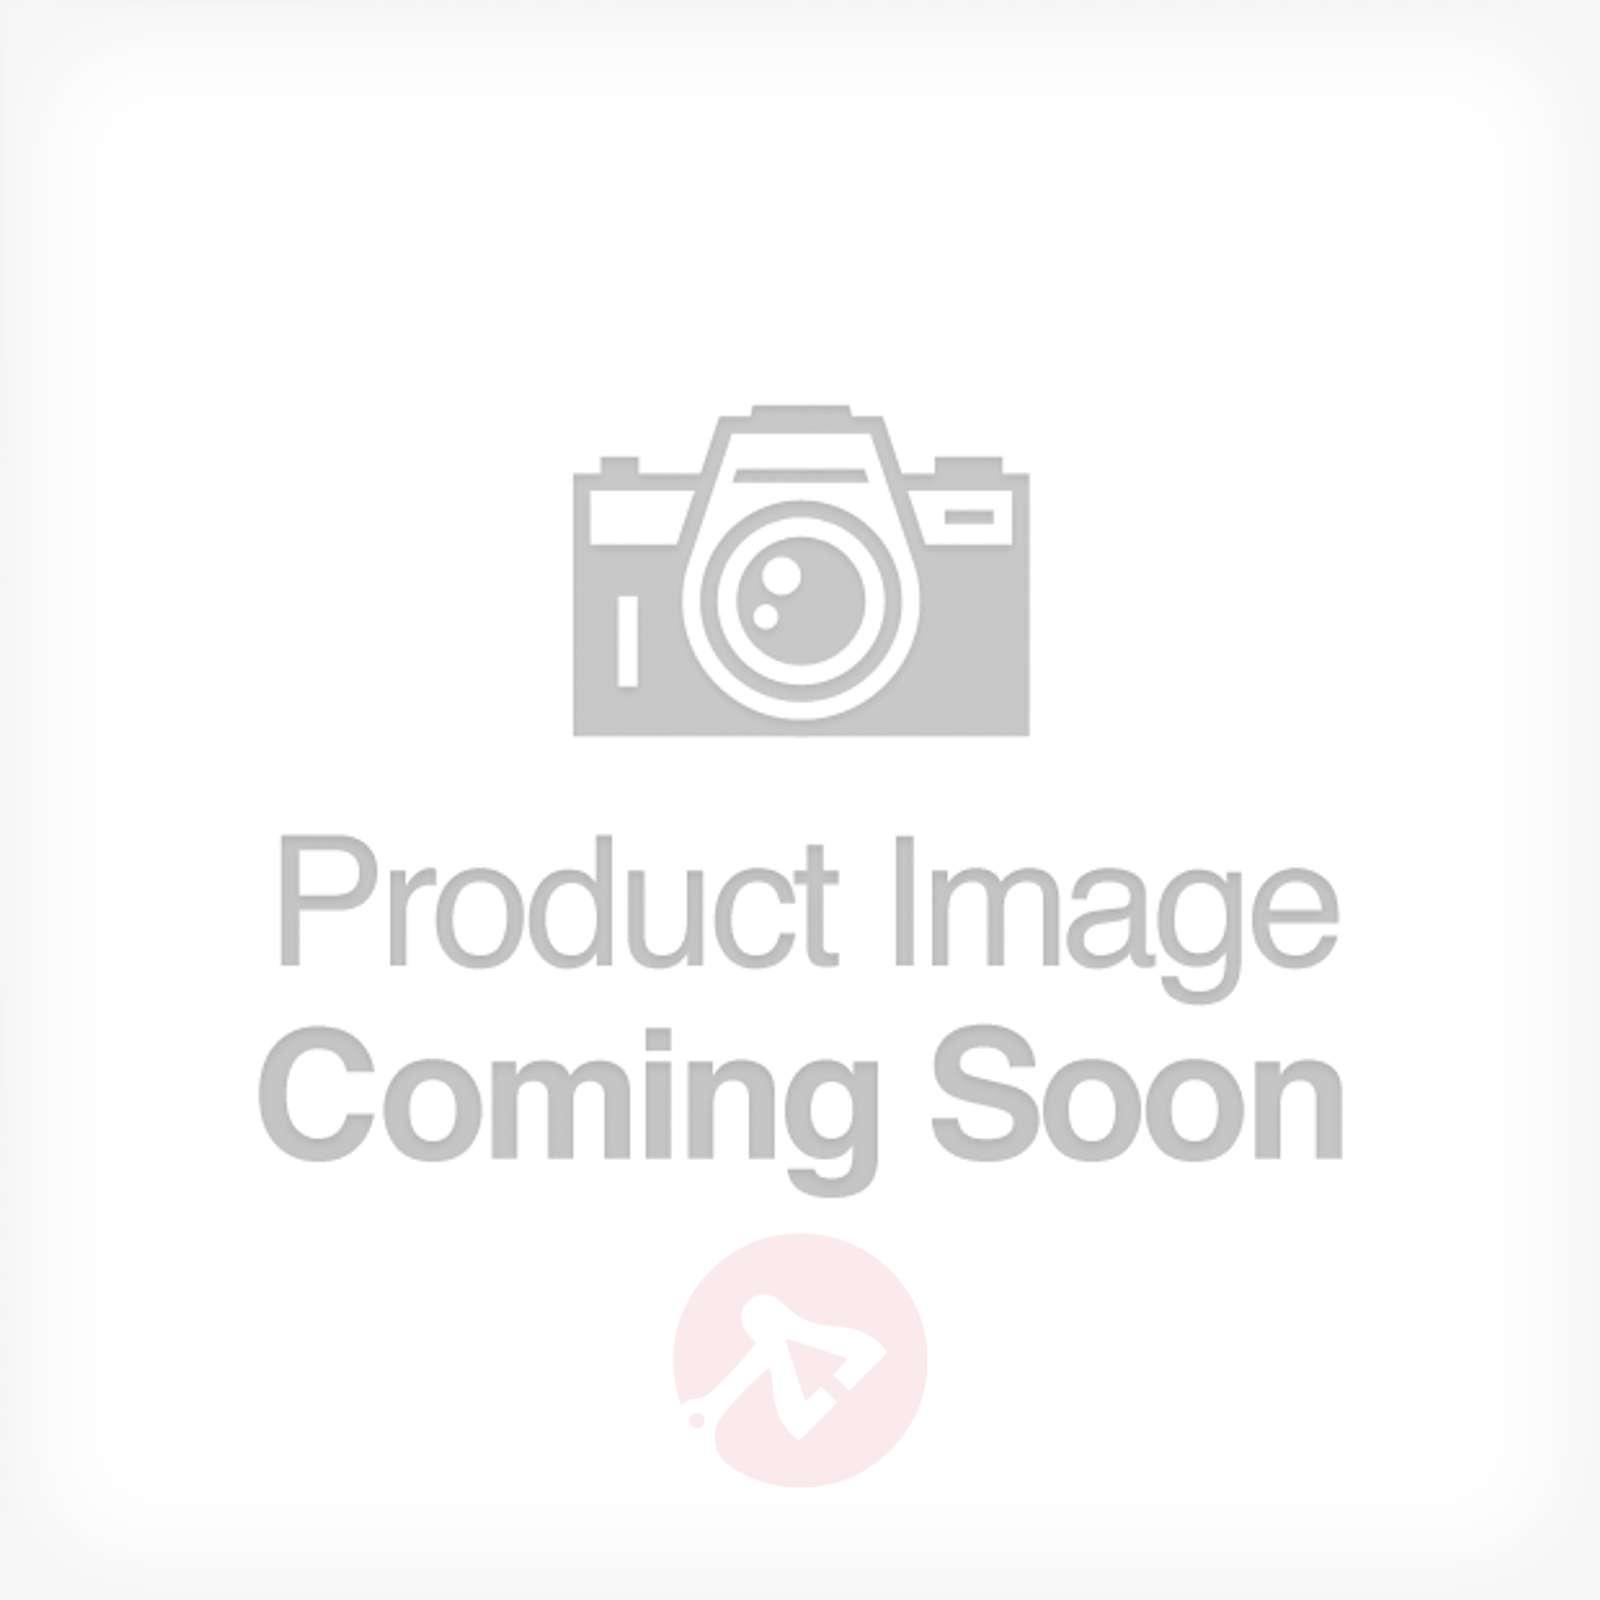 Pivotable LED recessed floor light PETRA BEAM-1002153X-01